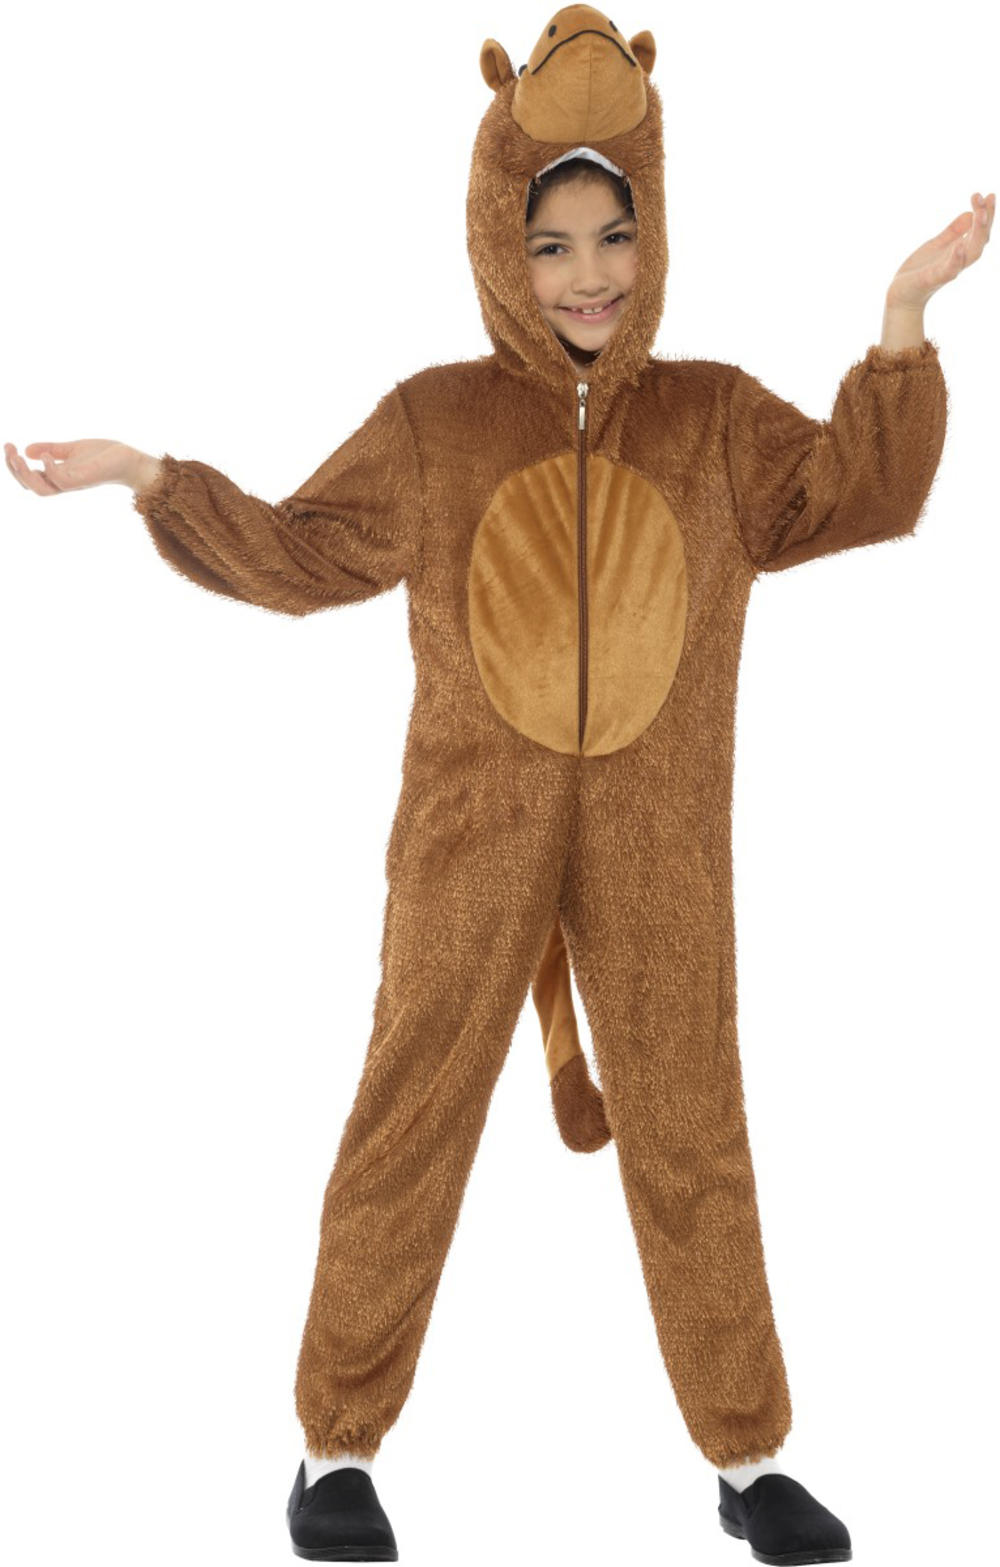 Camel Kids Fancy Dress Nativity Christmas Desert Animal Childrens Costume Outfit